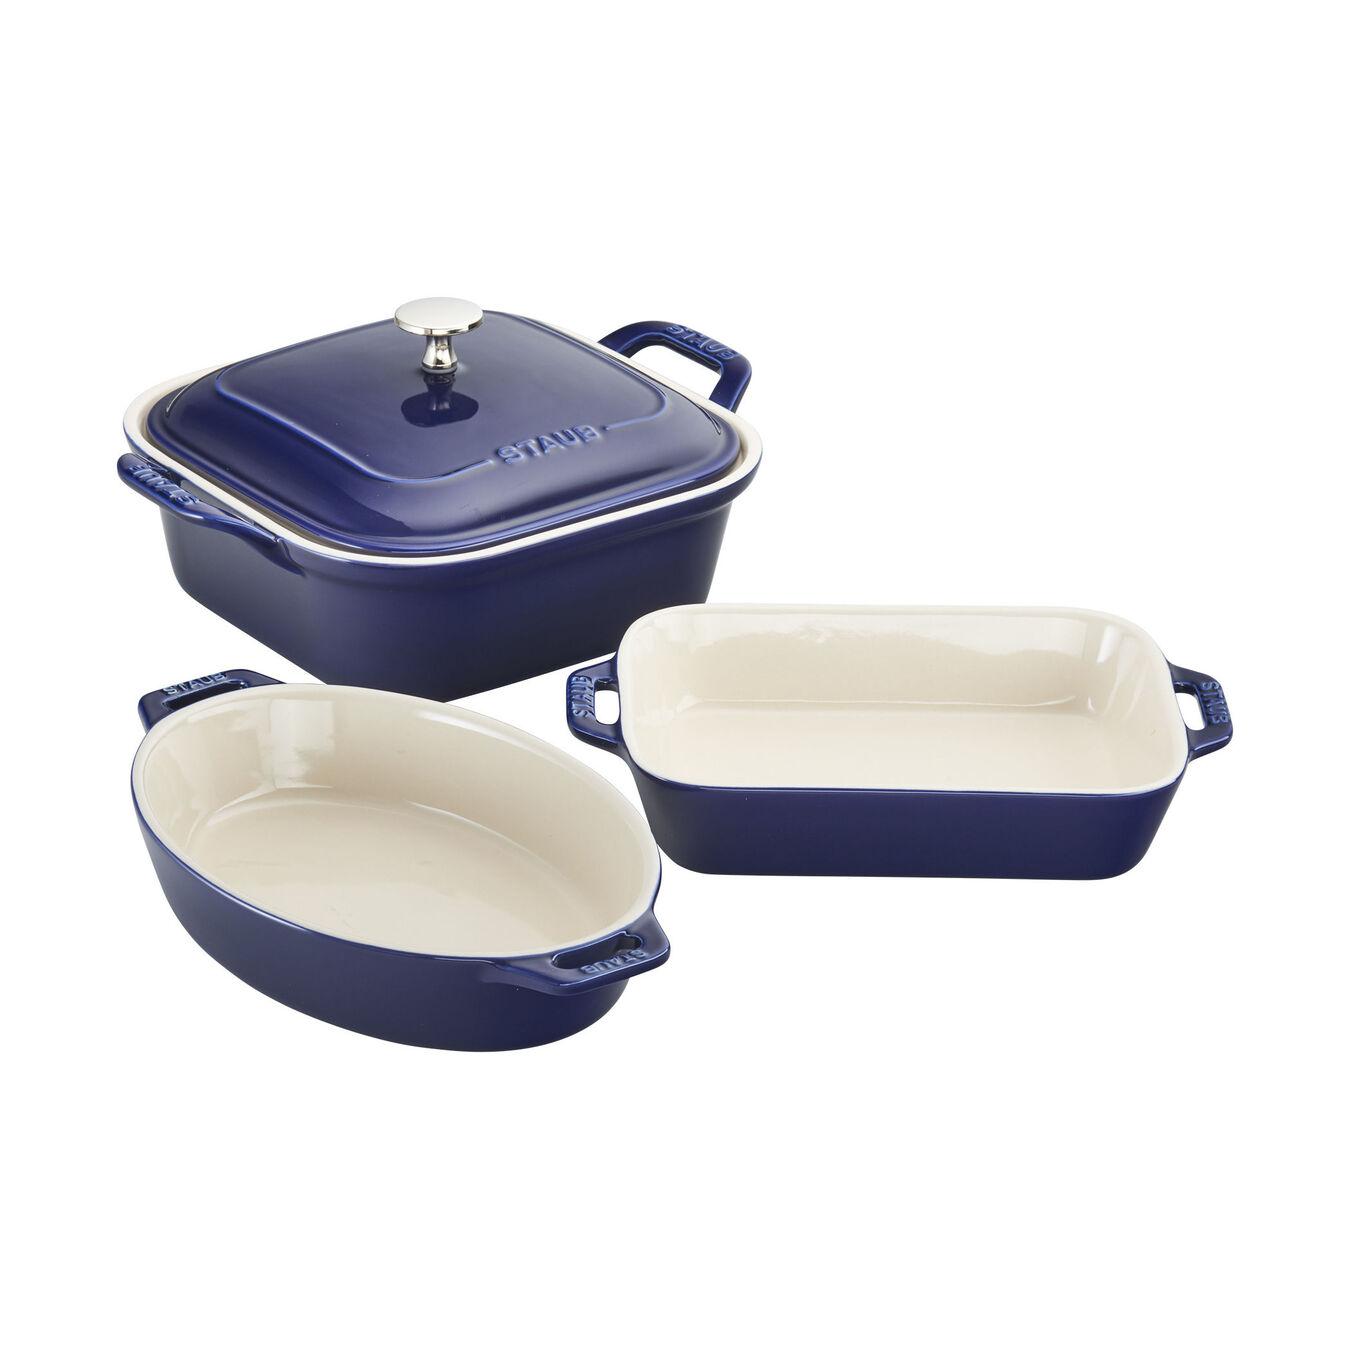 Ovenware set, 4 Piece | dark-blue,,large 1